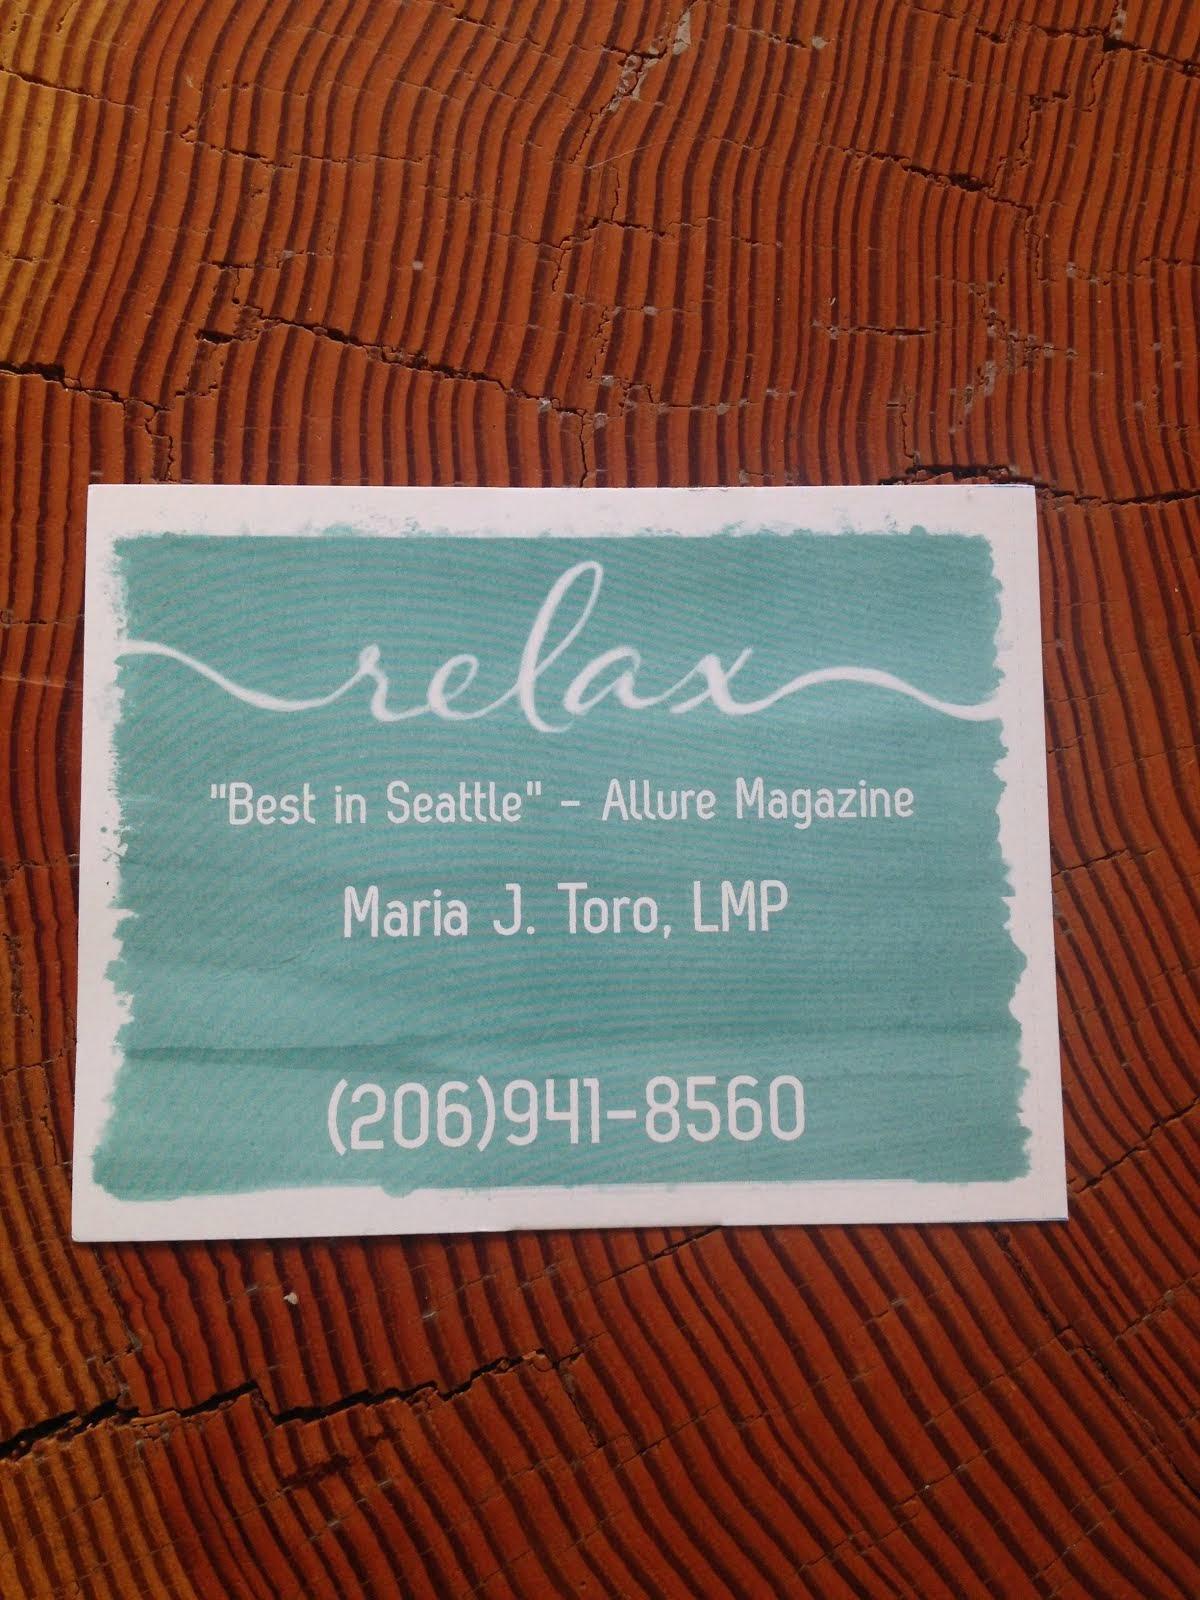 Massage heals. Maria J. Toro, LMP